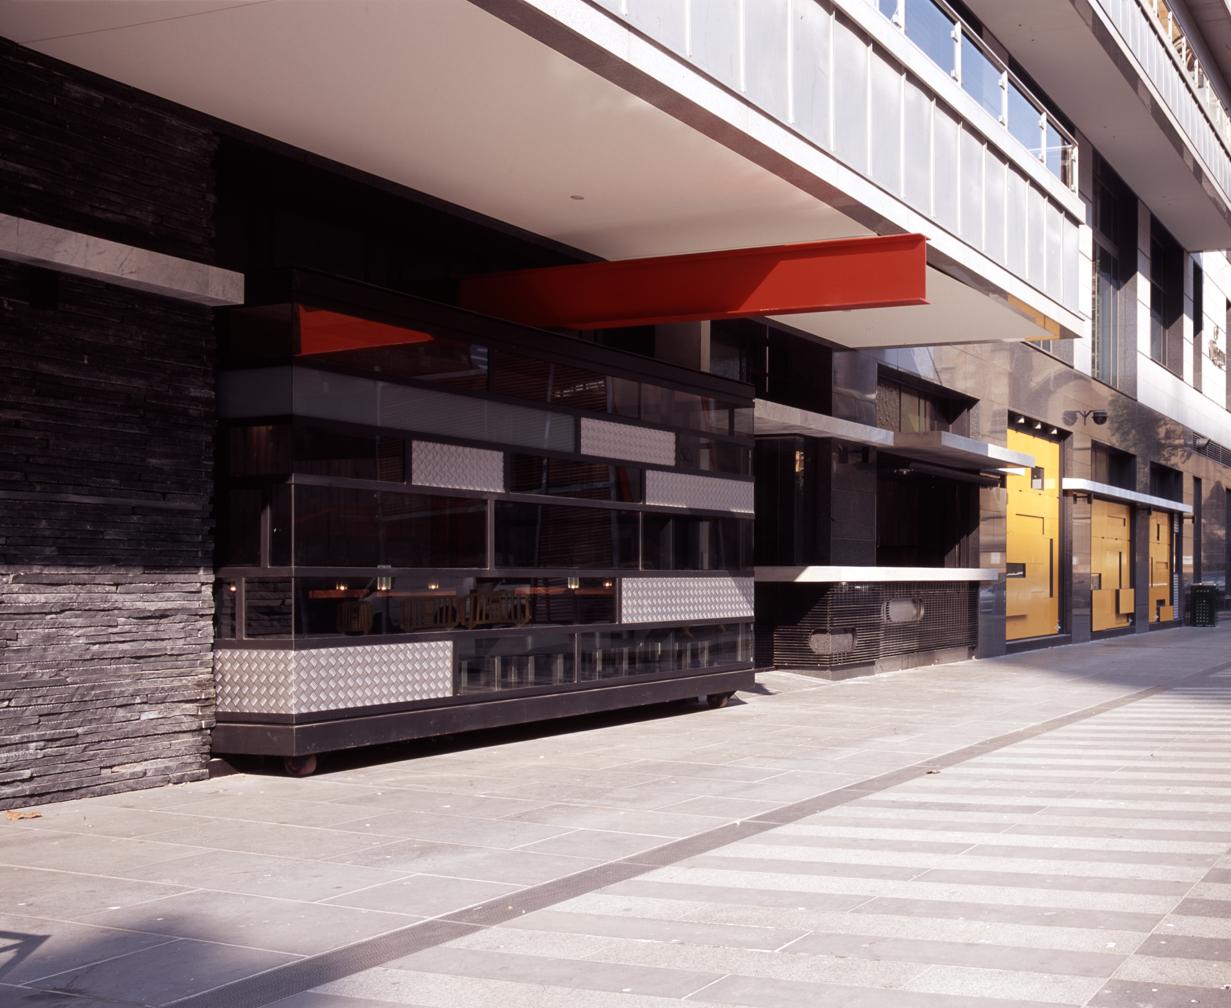 City Square-21-TMein.jpg